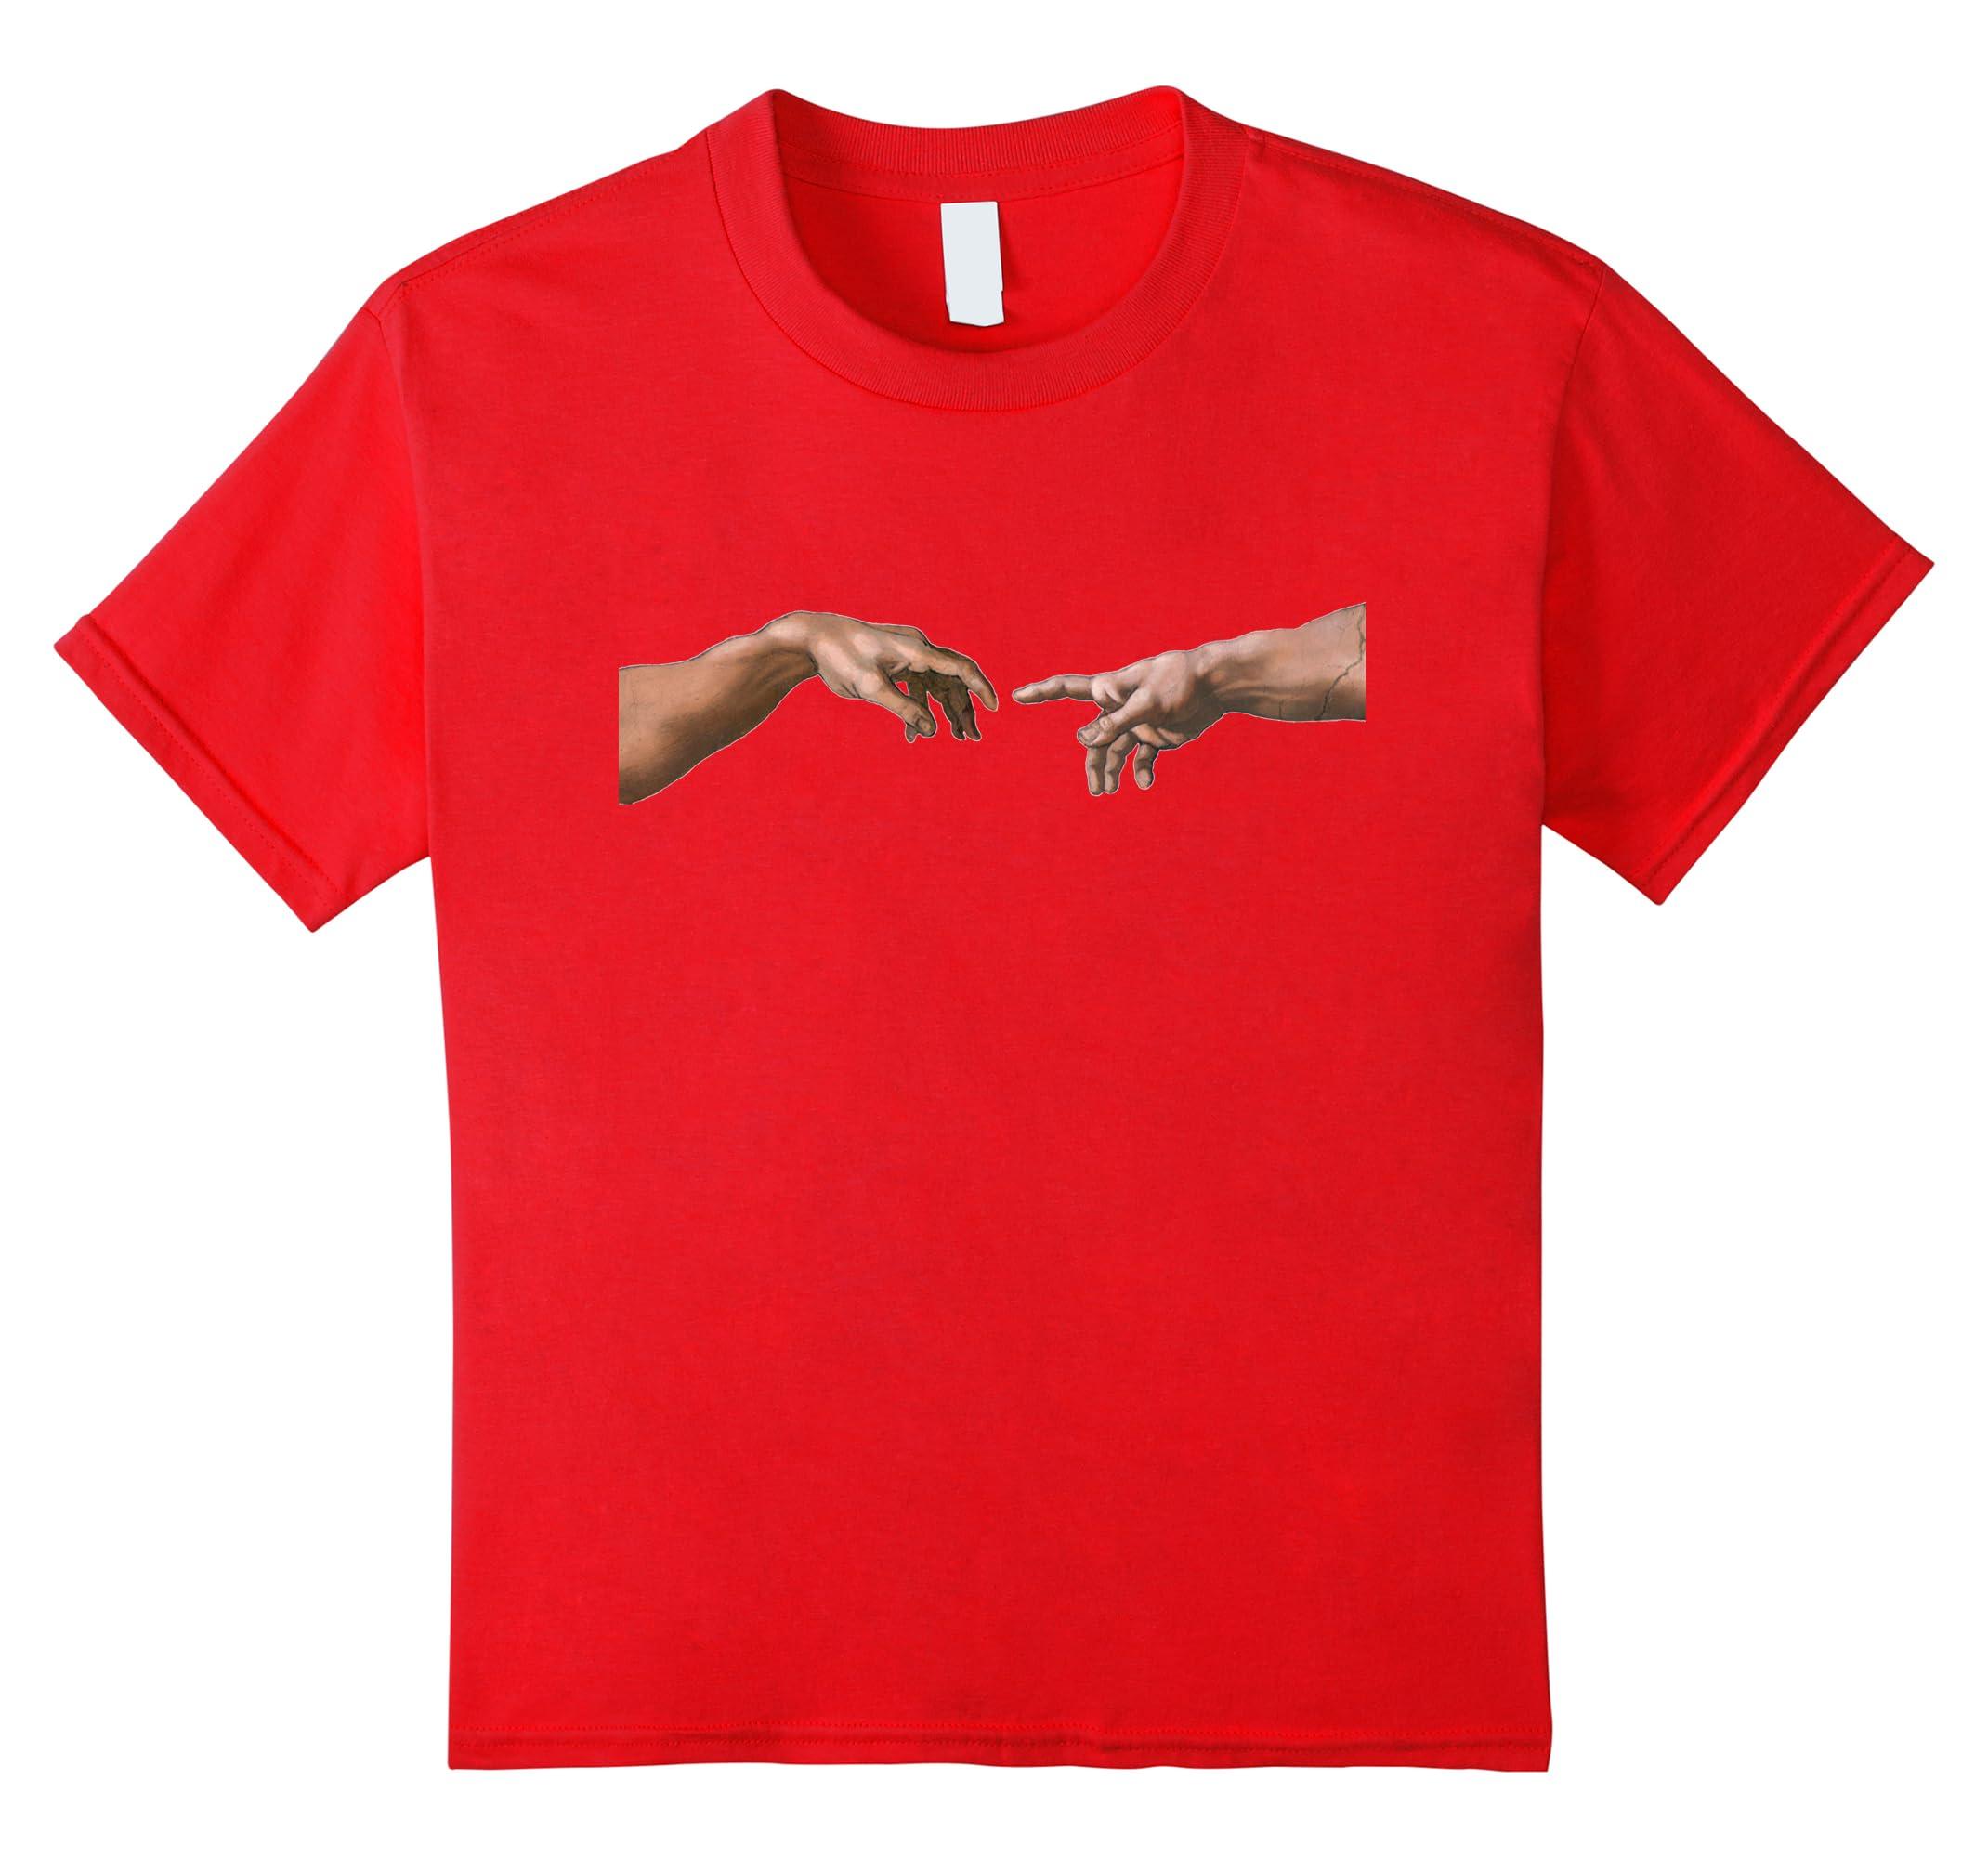 Creation Adam Michelangelo T Shirt-Samdetee